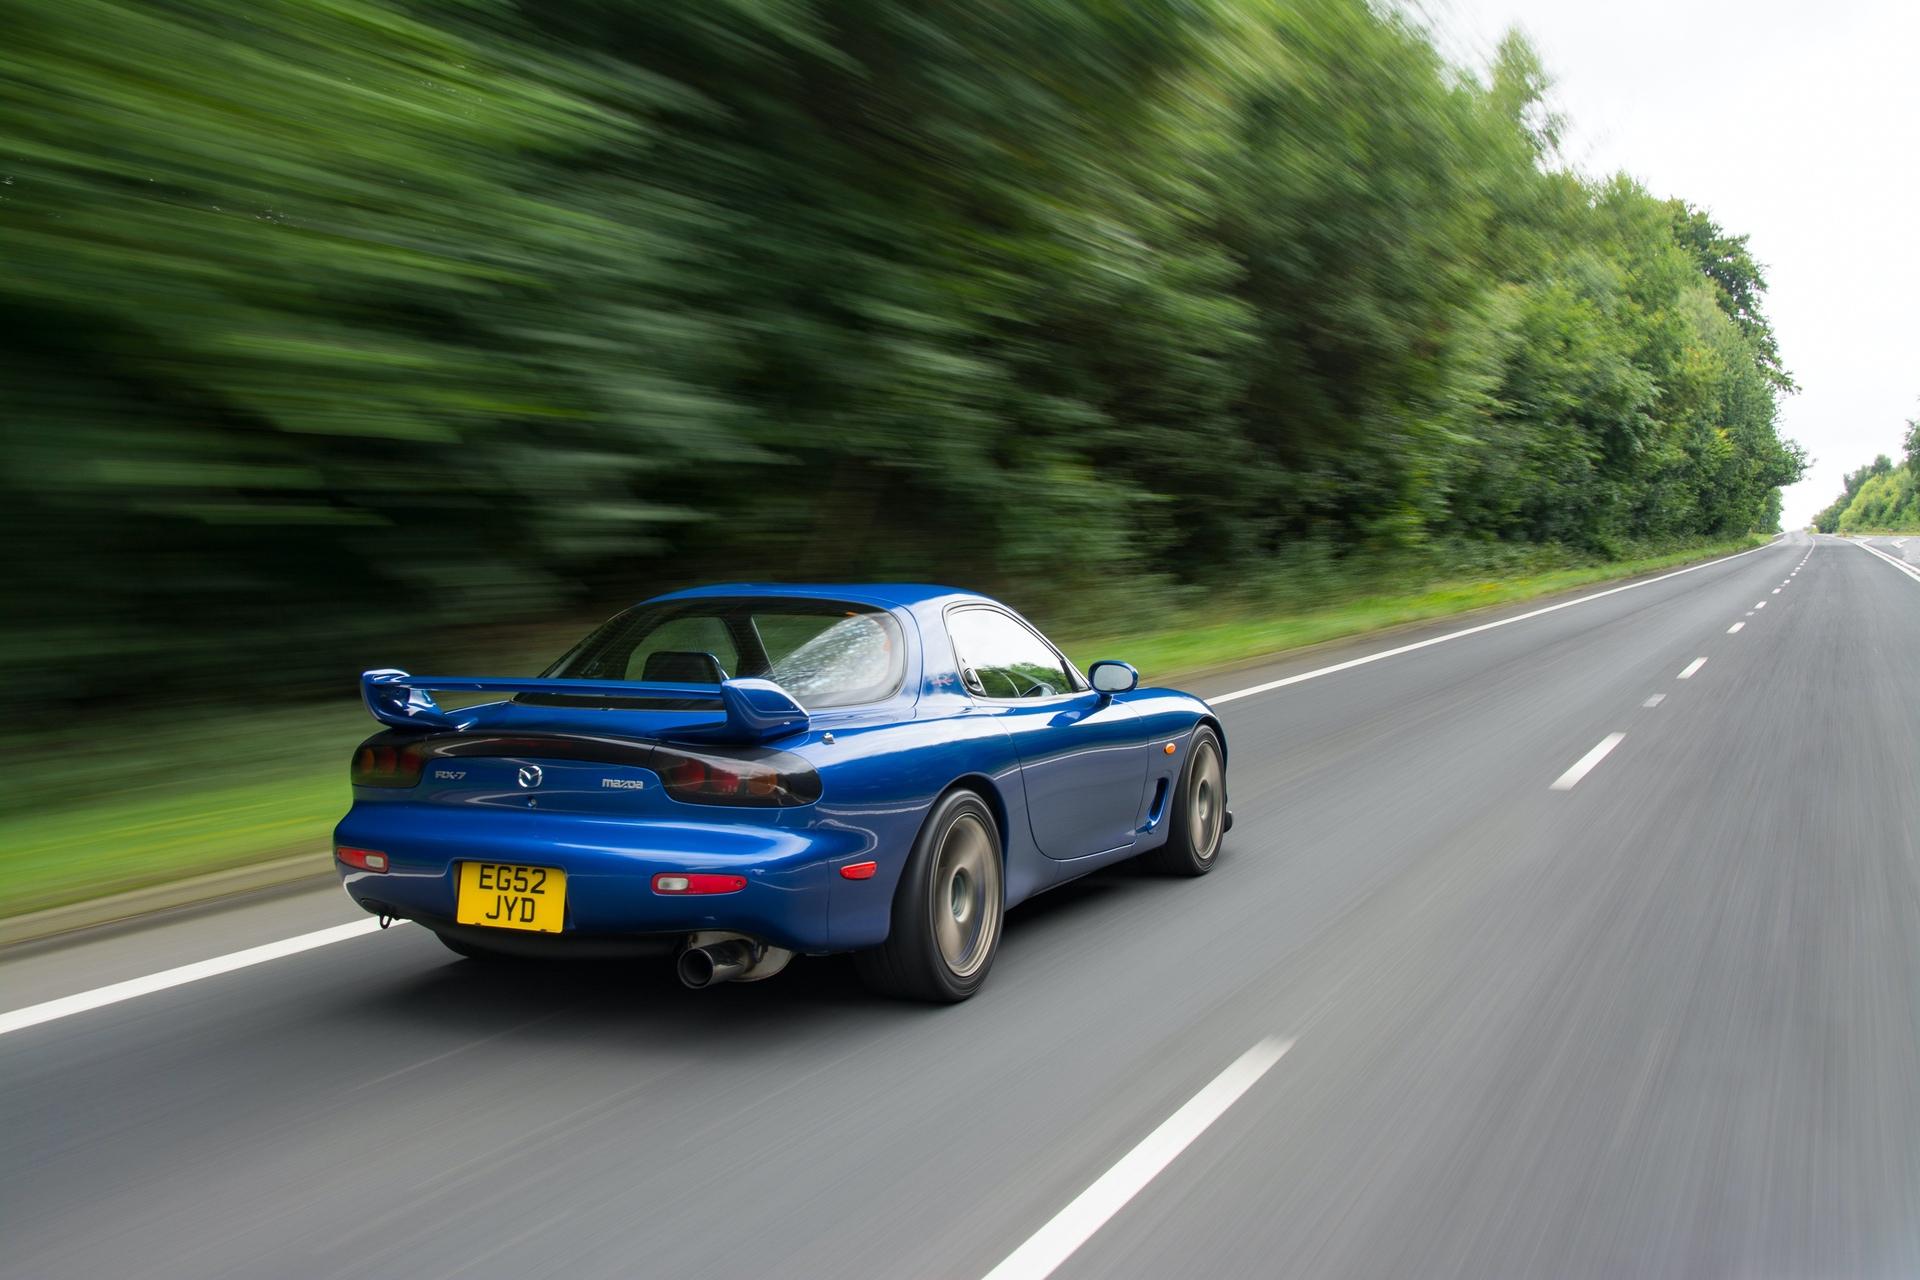 Mazda_RX-7_history_0068